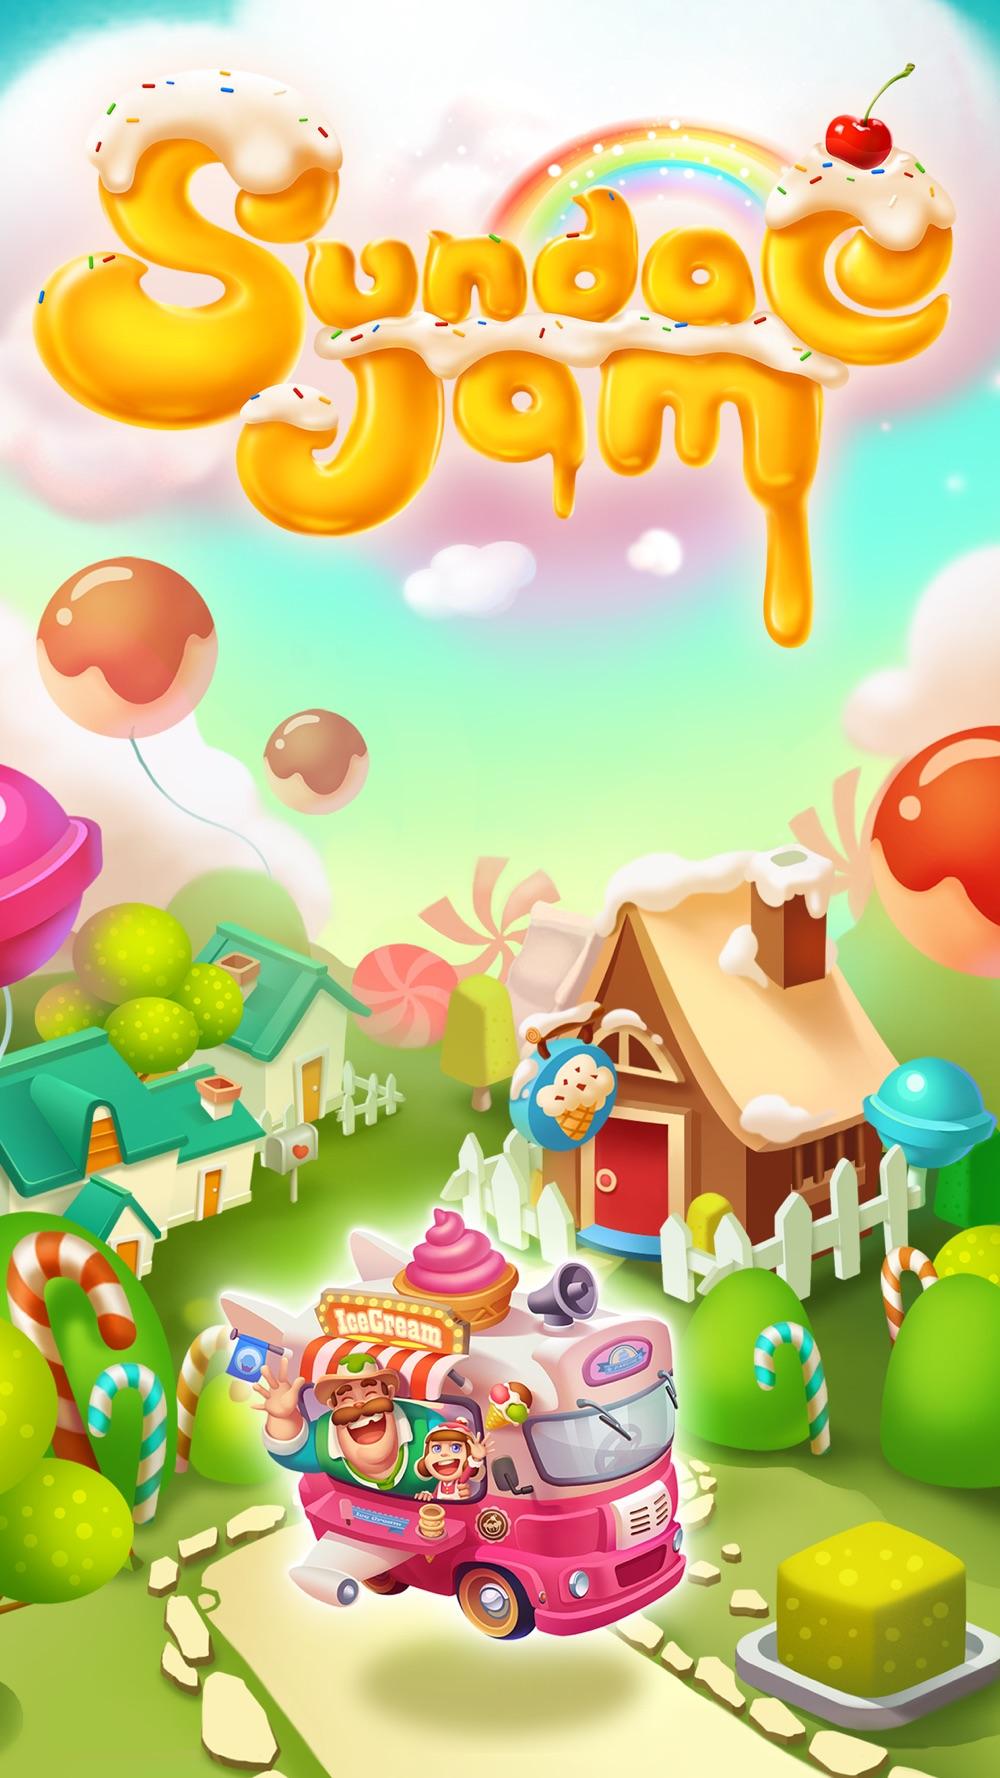 Icecream Sundae Jam – FREE Match 3 Puzzle & Arcade Game Cheat Codes